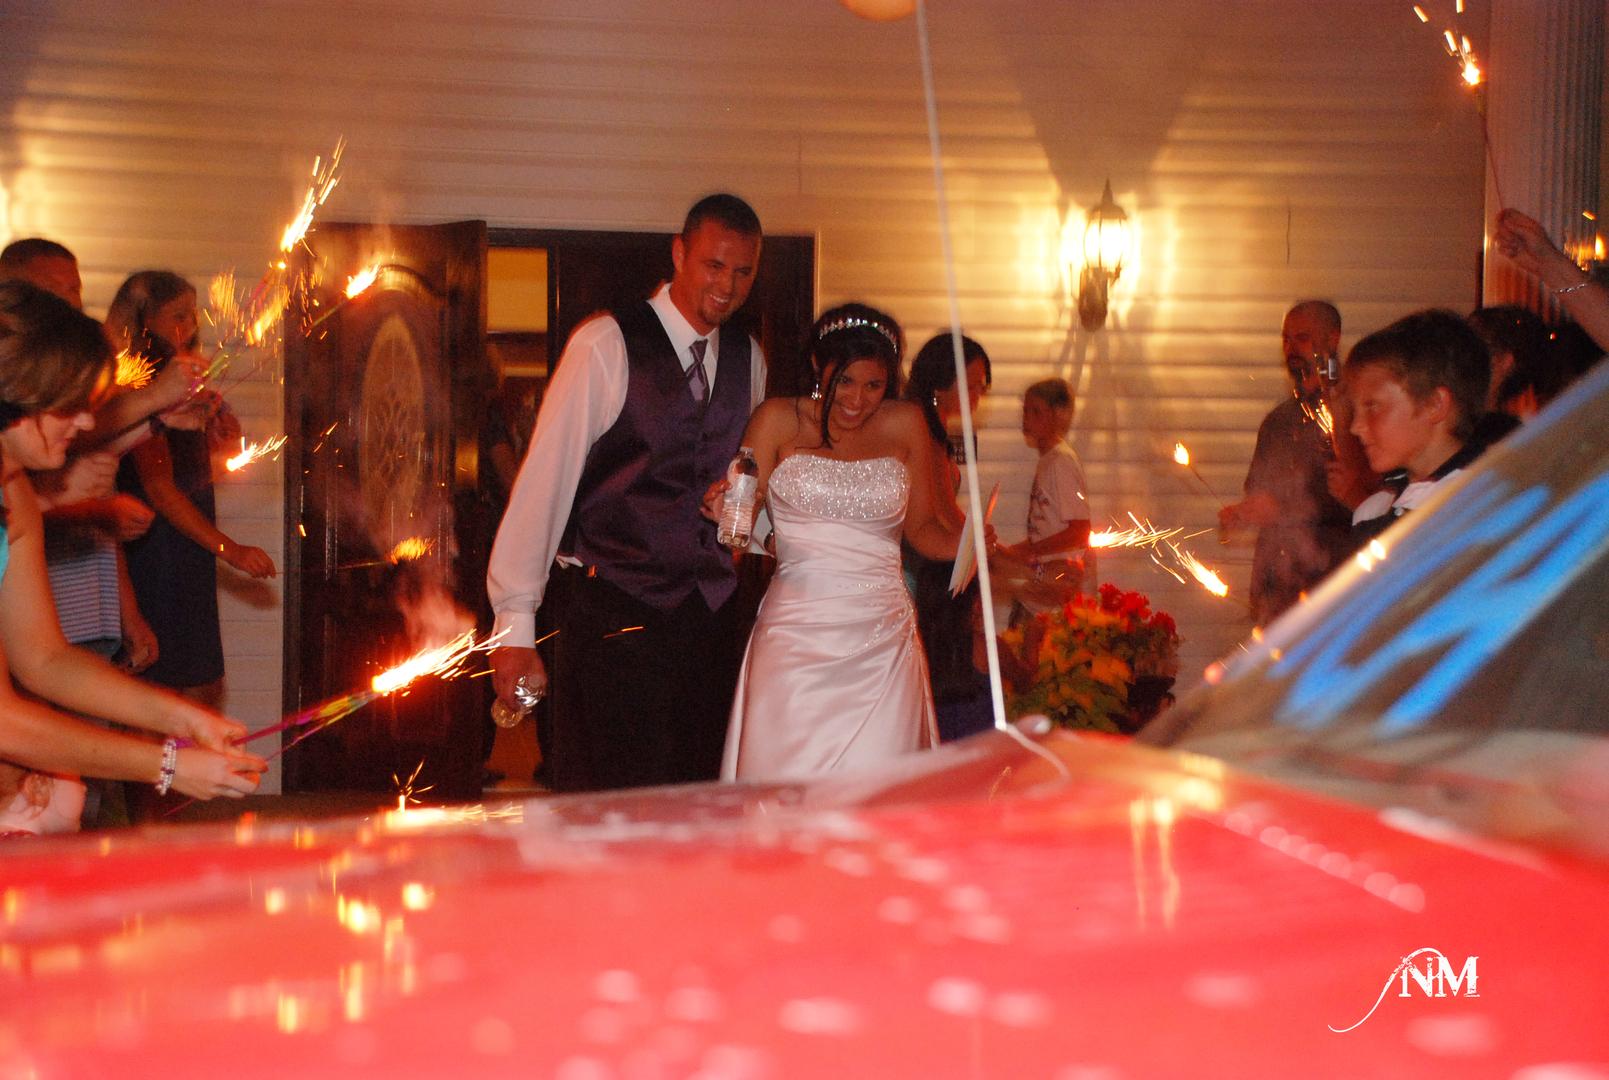 Wedding Locations, Wedding Sites - Arbuckle Wedding Chapel ...